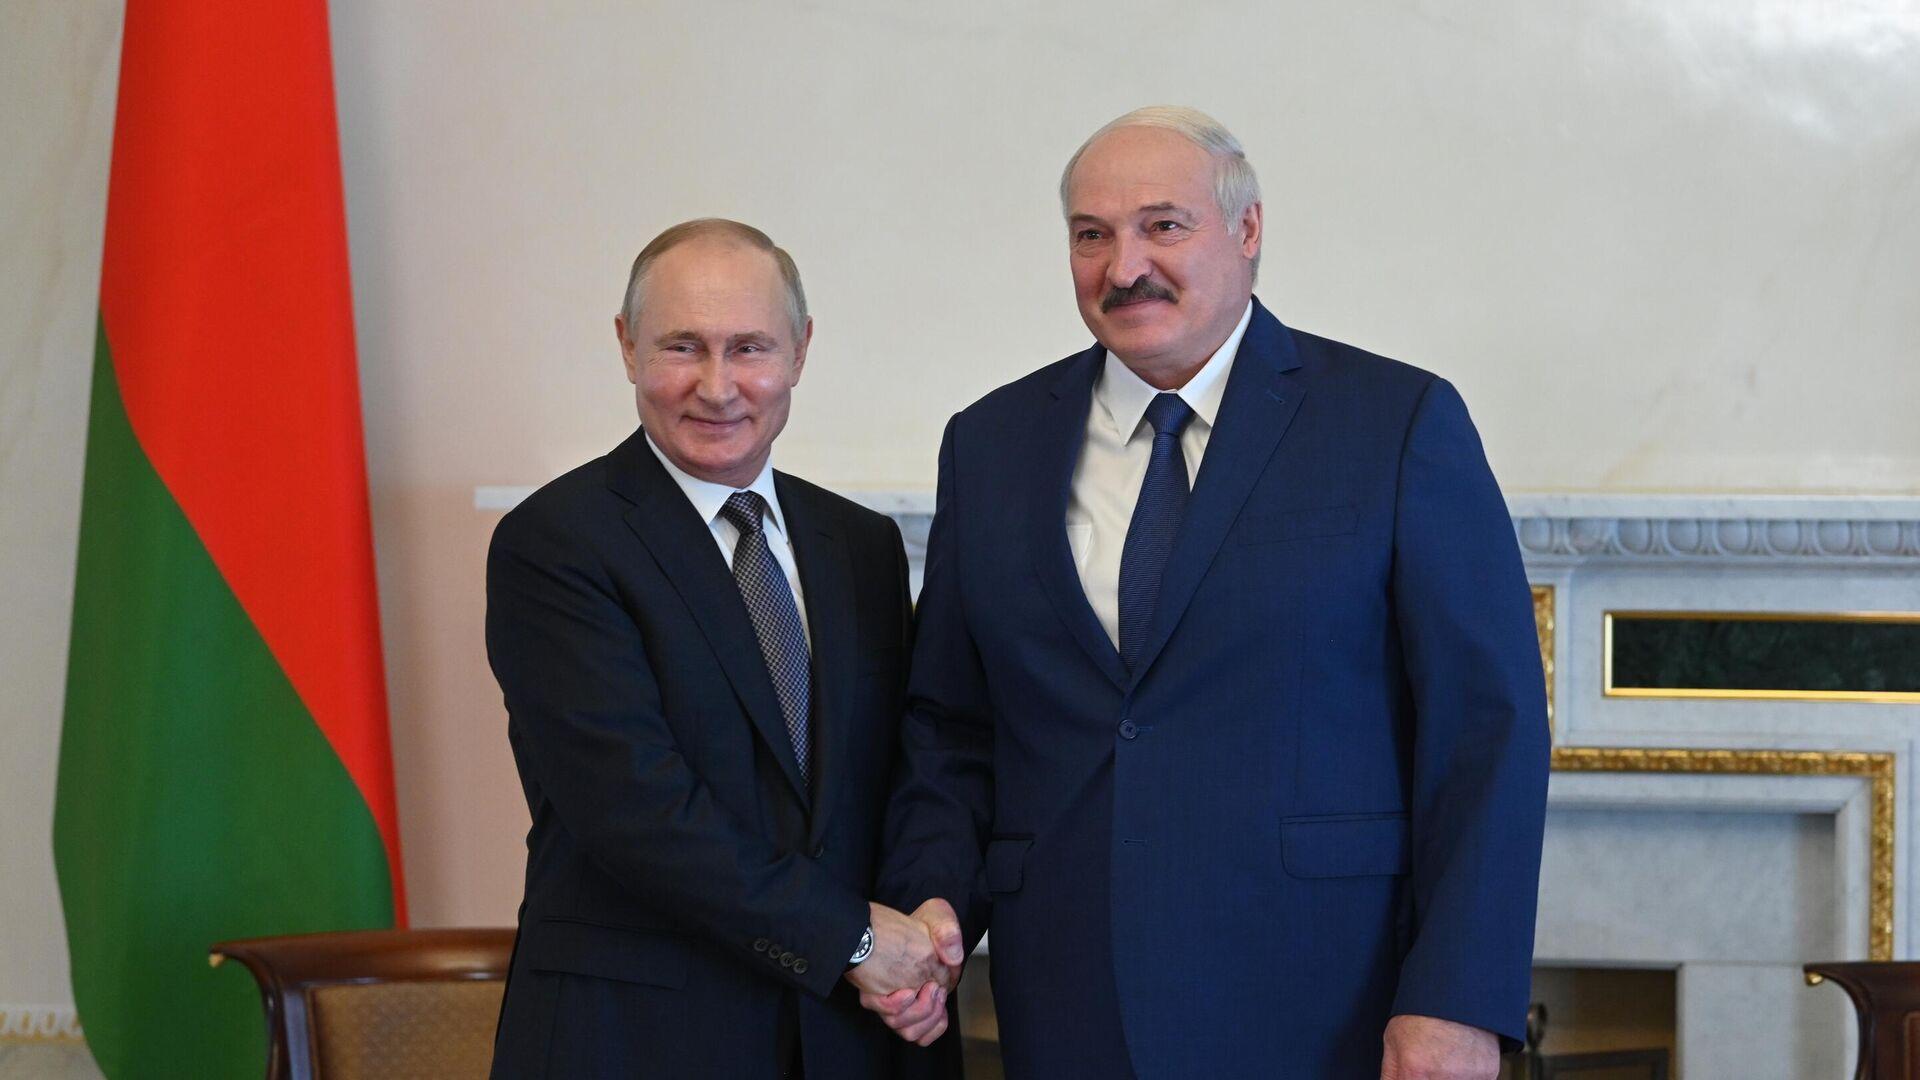 Президент РФ Владимир Путин и президент Белоруссии Александр Лукашенко во время встречи - РИА Новости, 1920, 21.07.2021